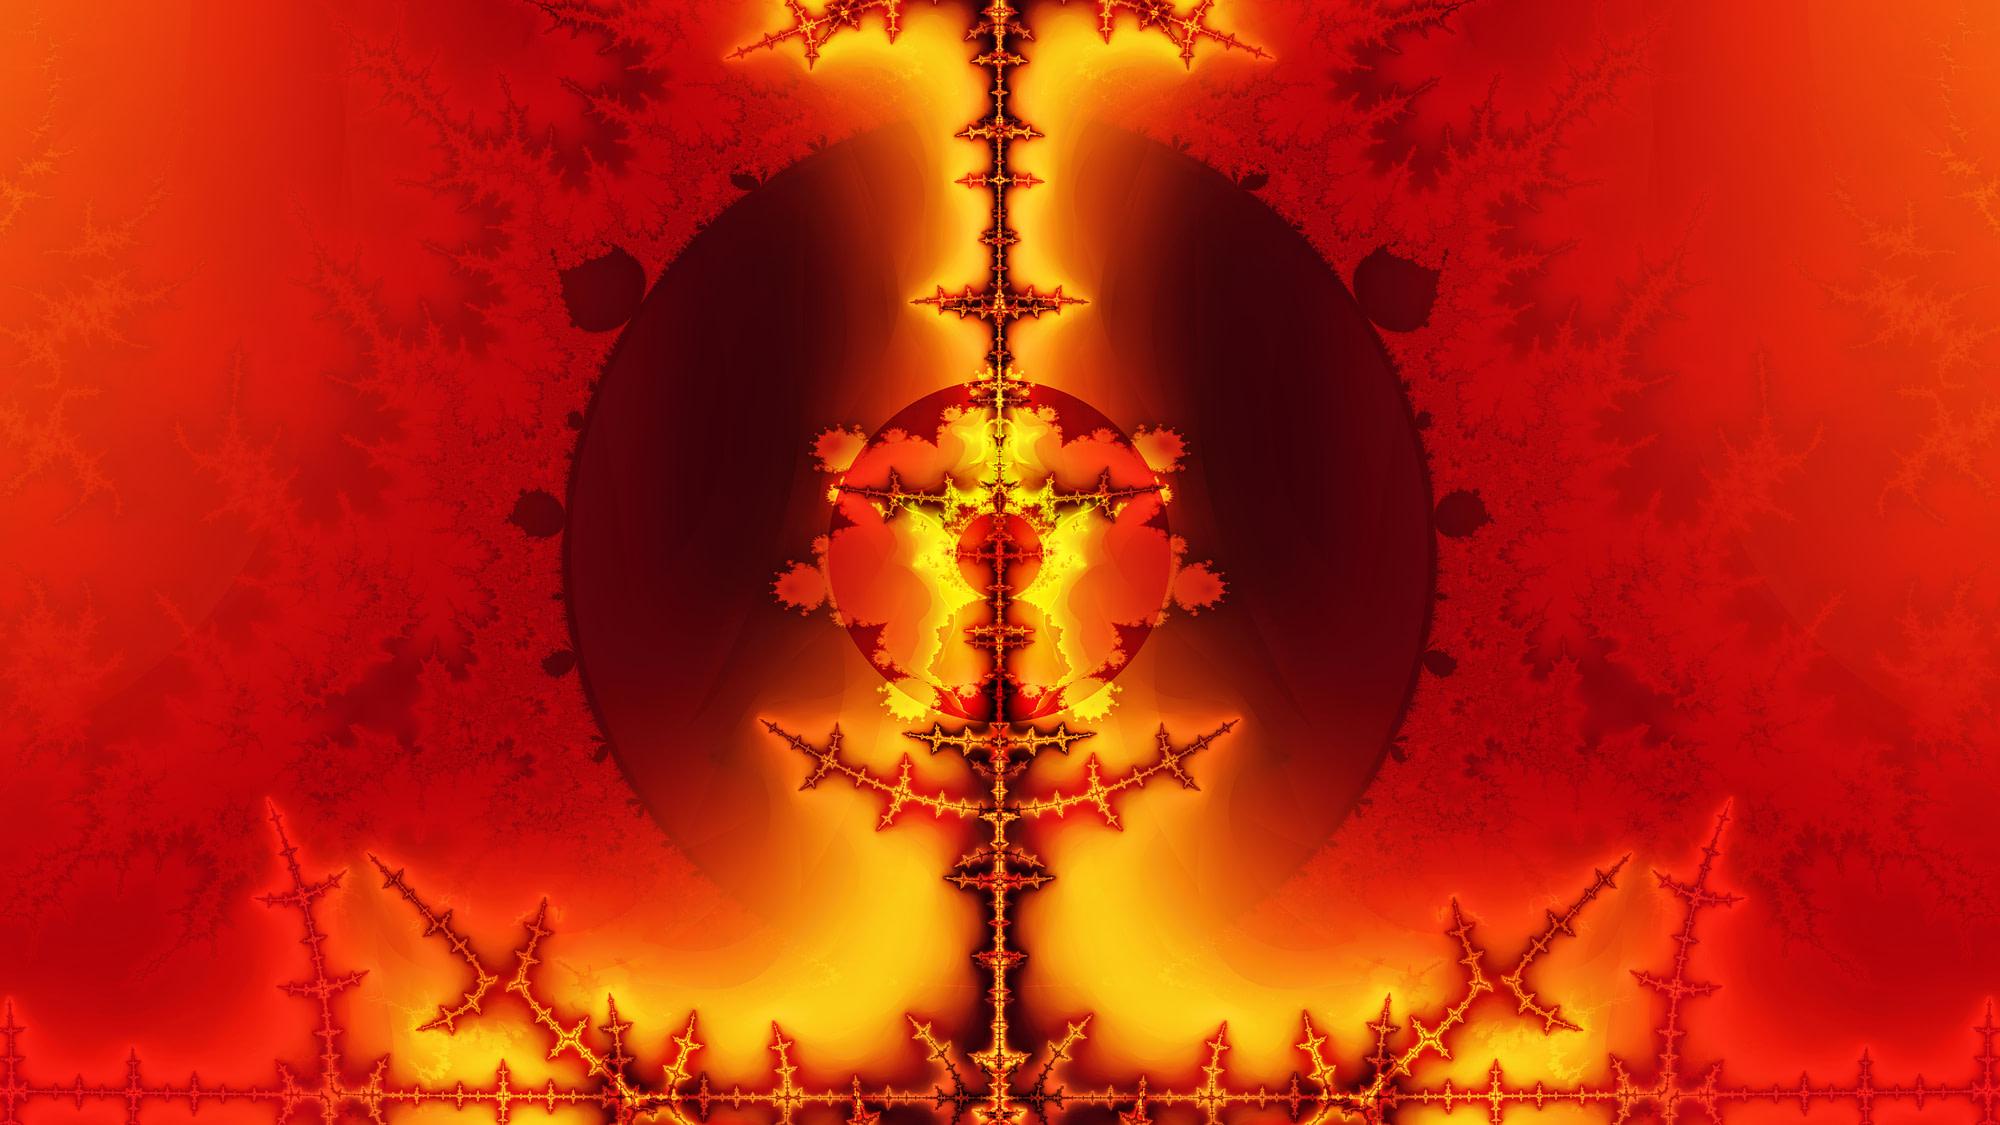 Bible fractal of the rod of God